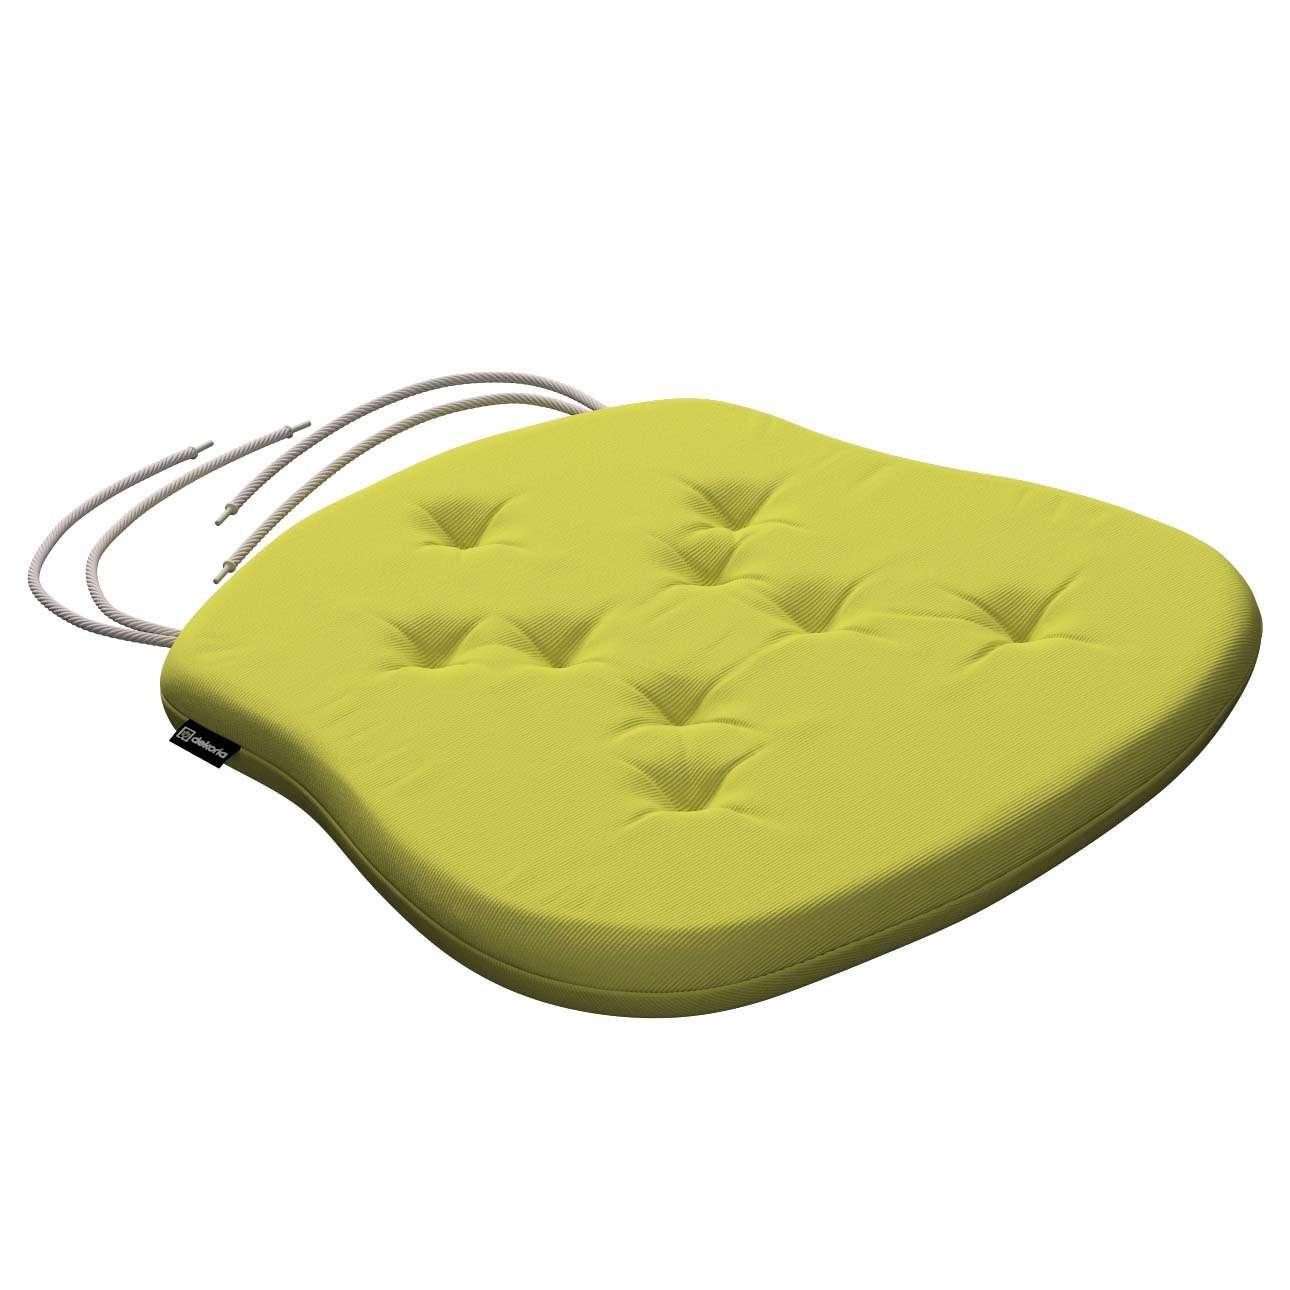 Kėdės pagalvėlė Filip  41 x 38 x 3,5 cm kolekcijoje Jupiter, audinys: 127-50